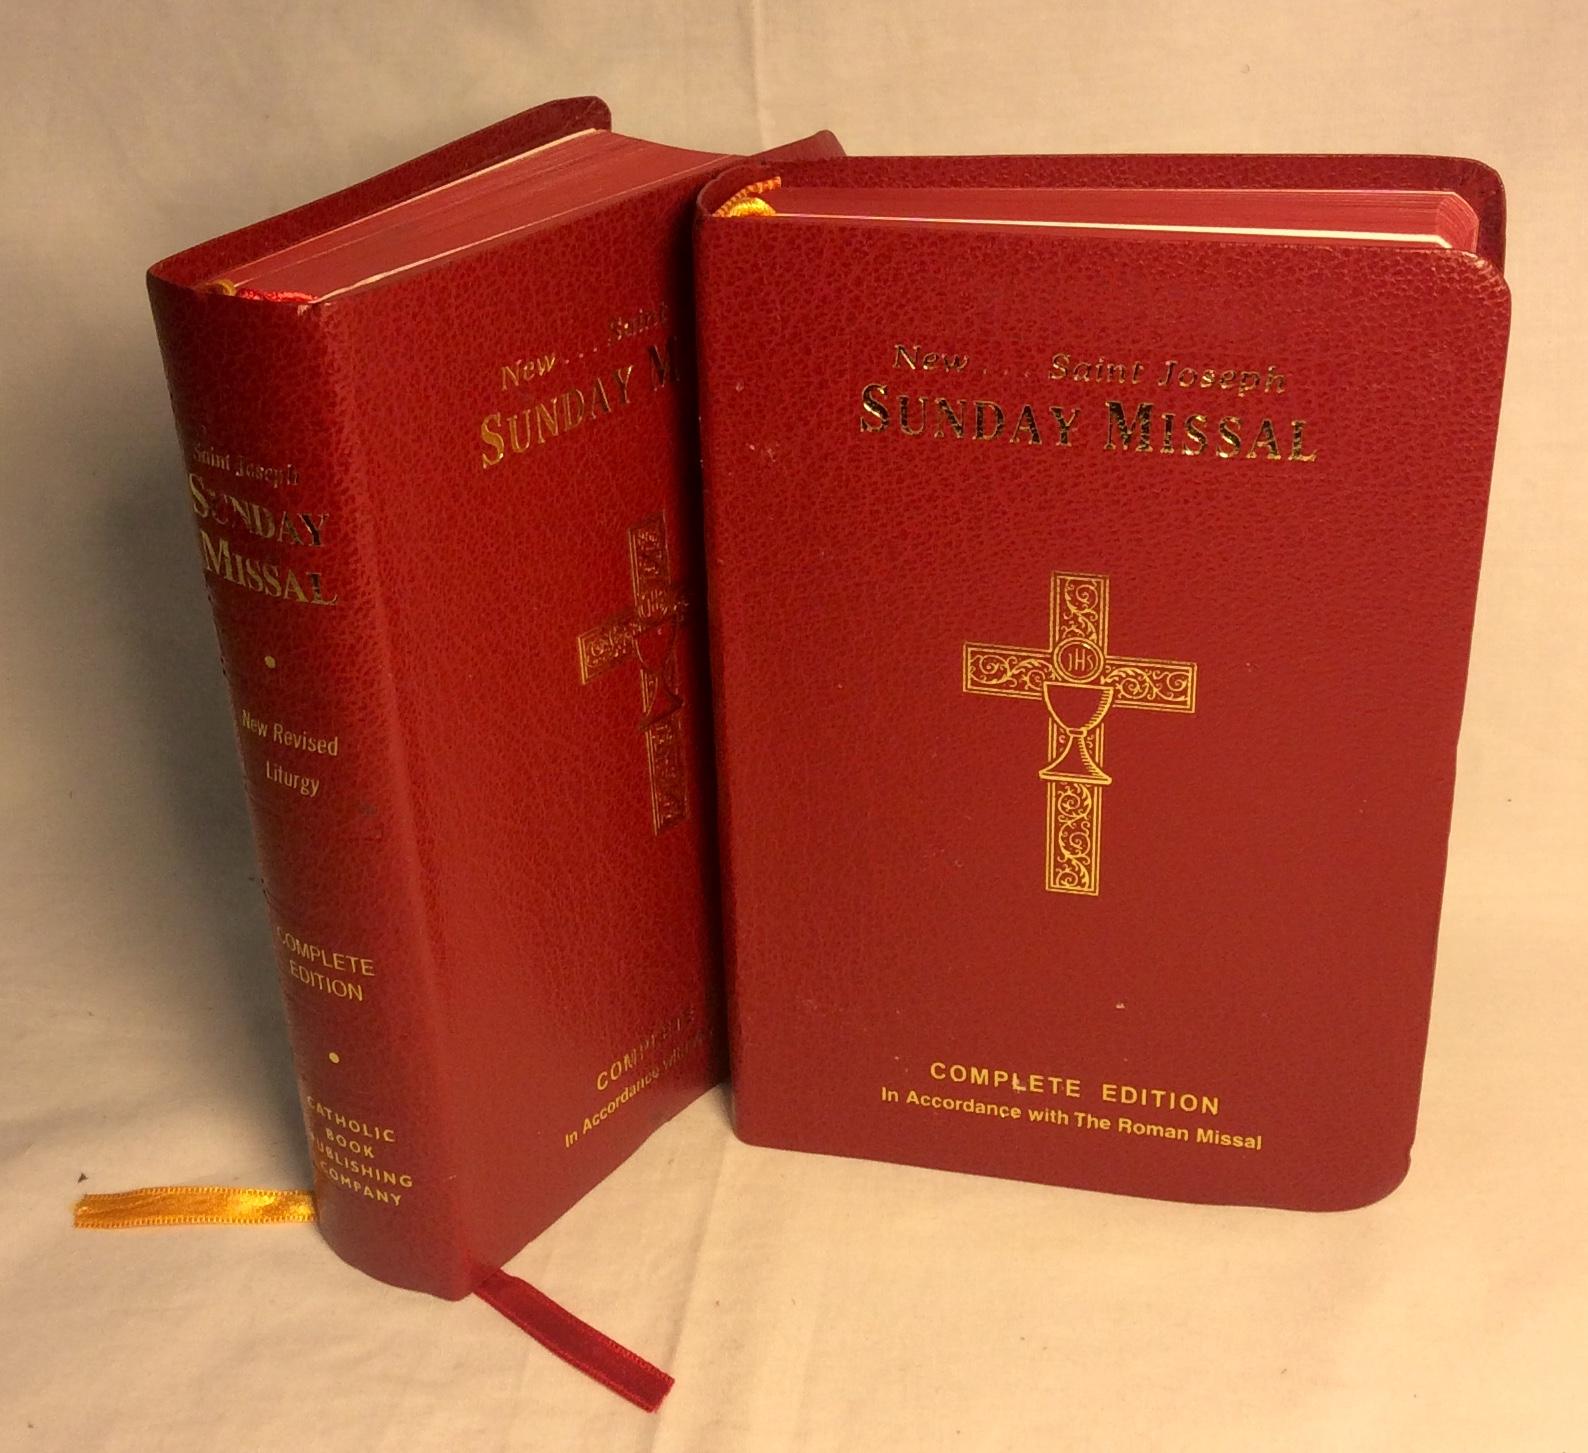 Red New Saint Joseph Sunday Missal